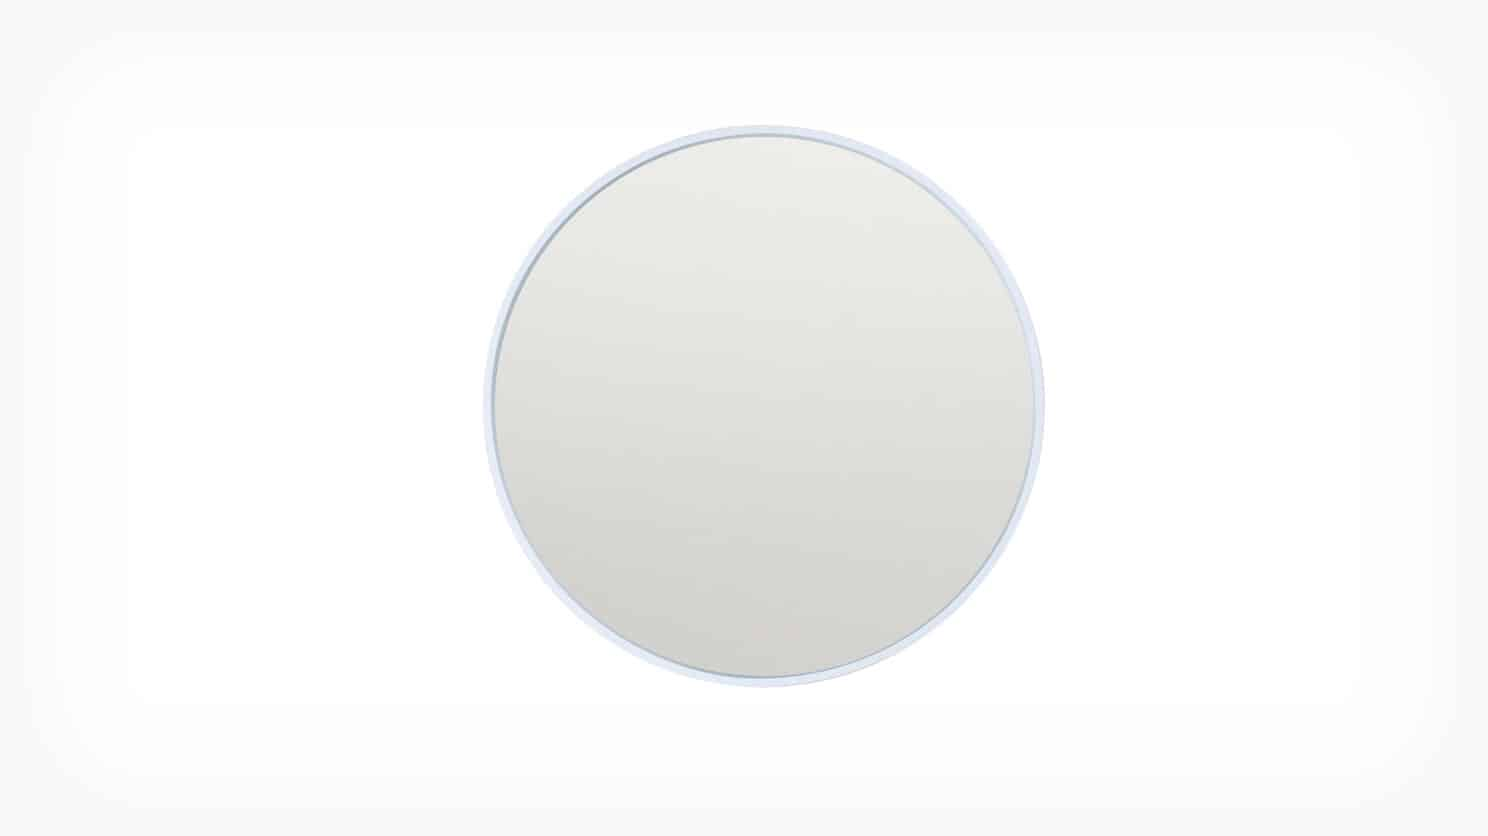 Medium White Conner Mirror Front